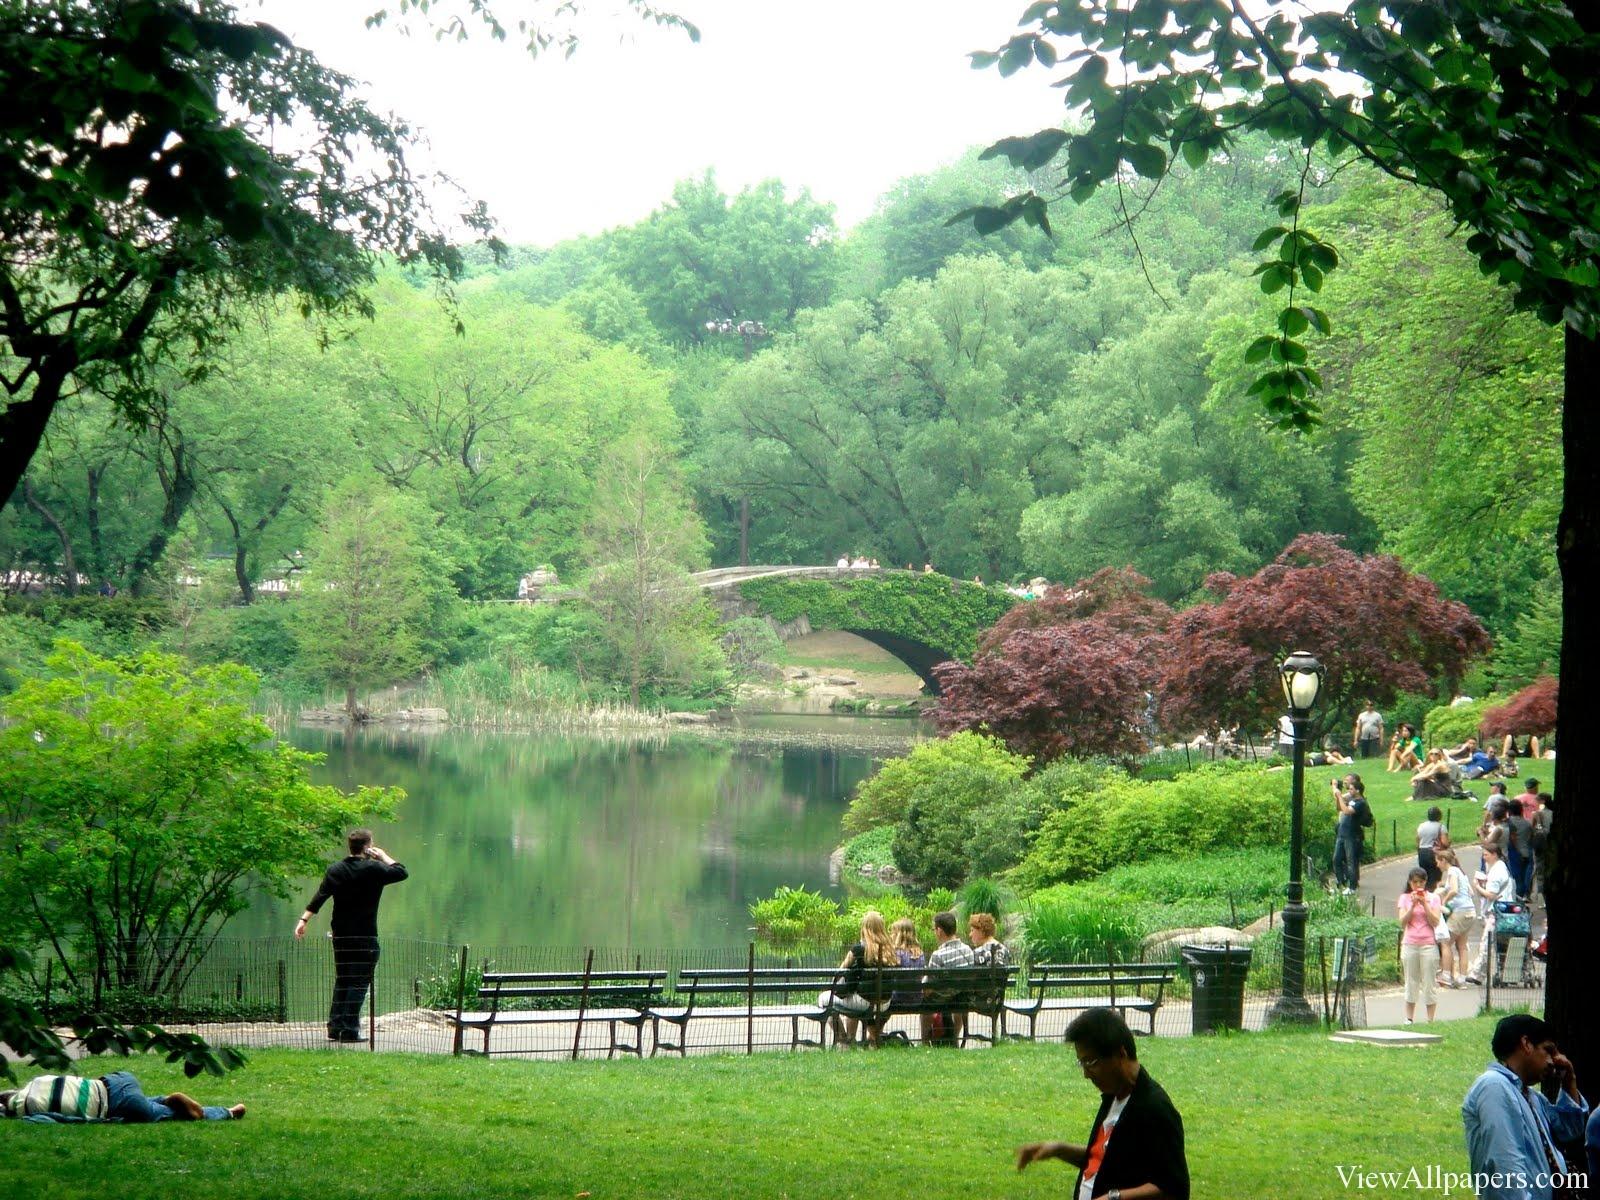 Park Summer Time High Resolution Wallpaper download Central Park 1600x1200